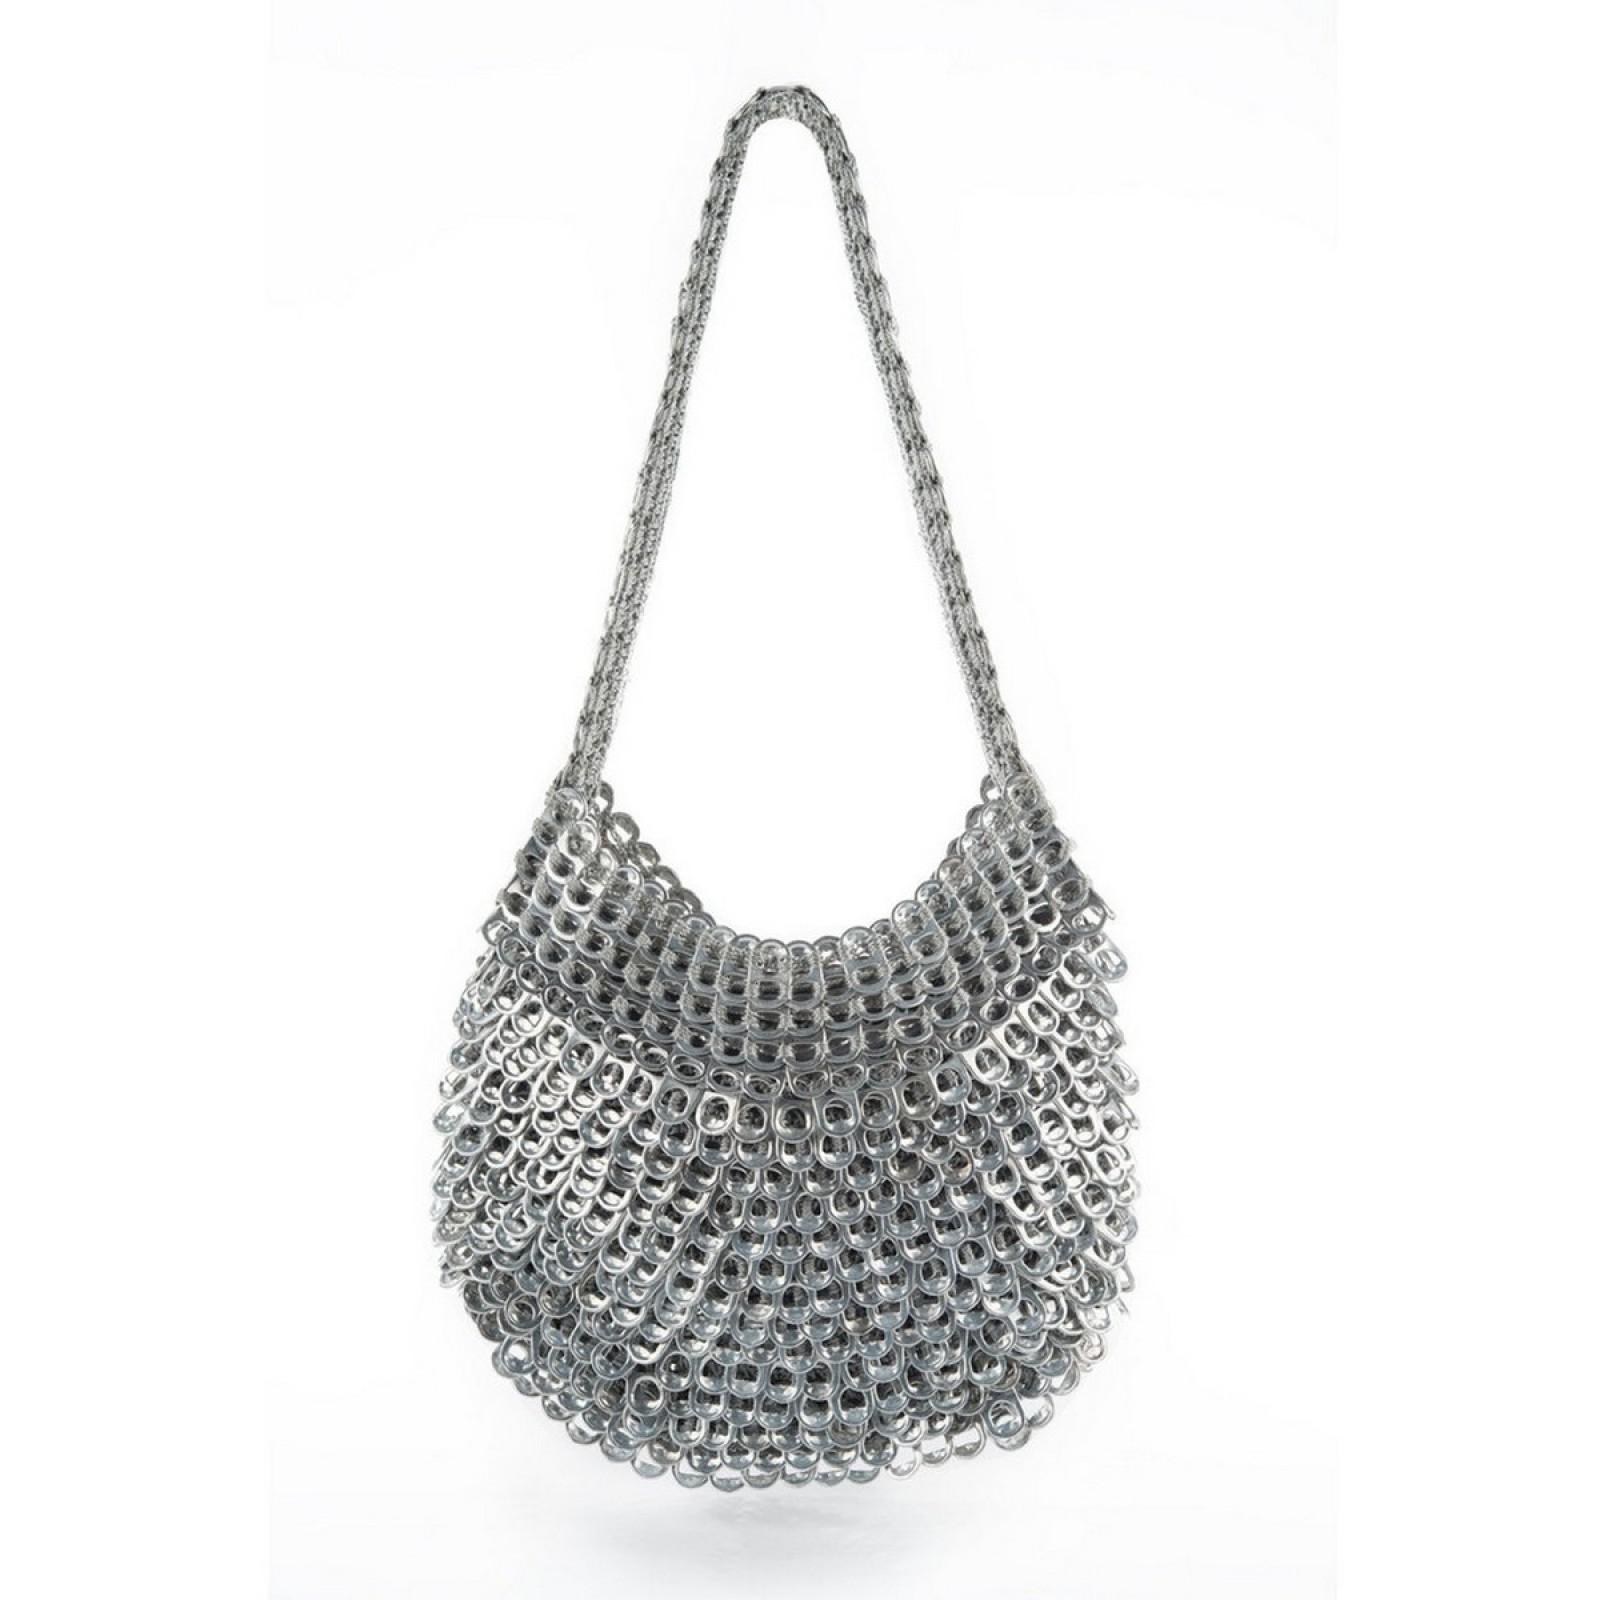 Greta Handmade Recycled Shoulder Bag (Silver) - Escama Studio